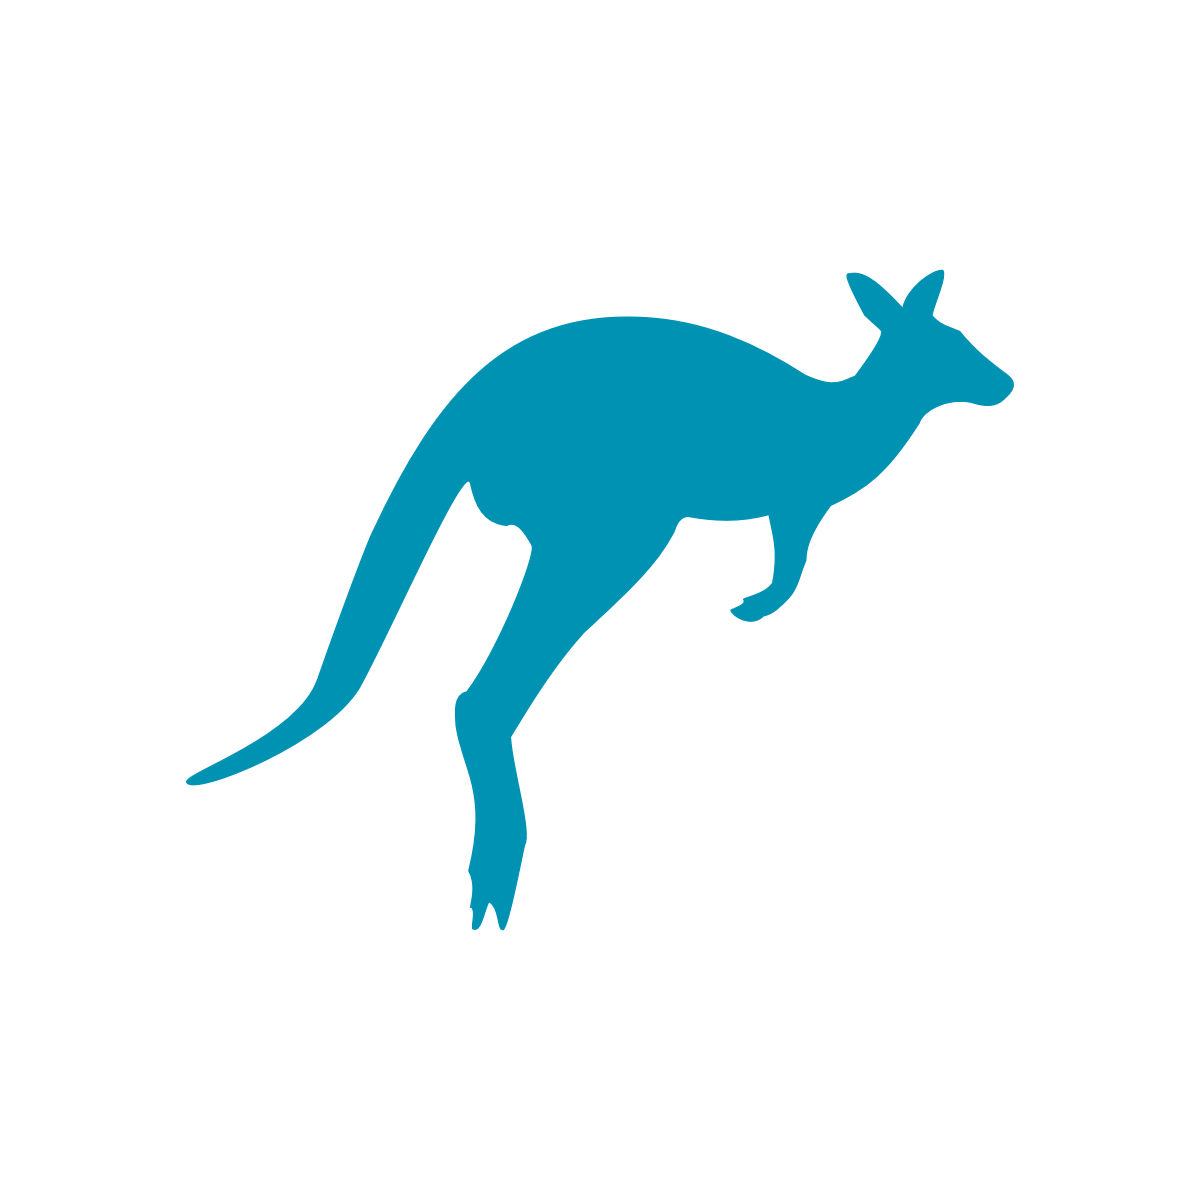 noun_Kangaroo_184691(1)